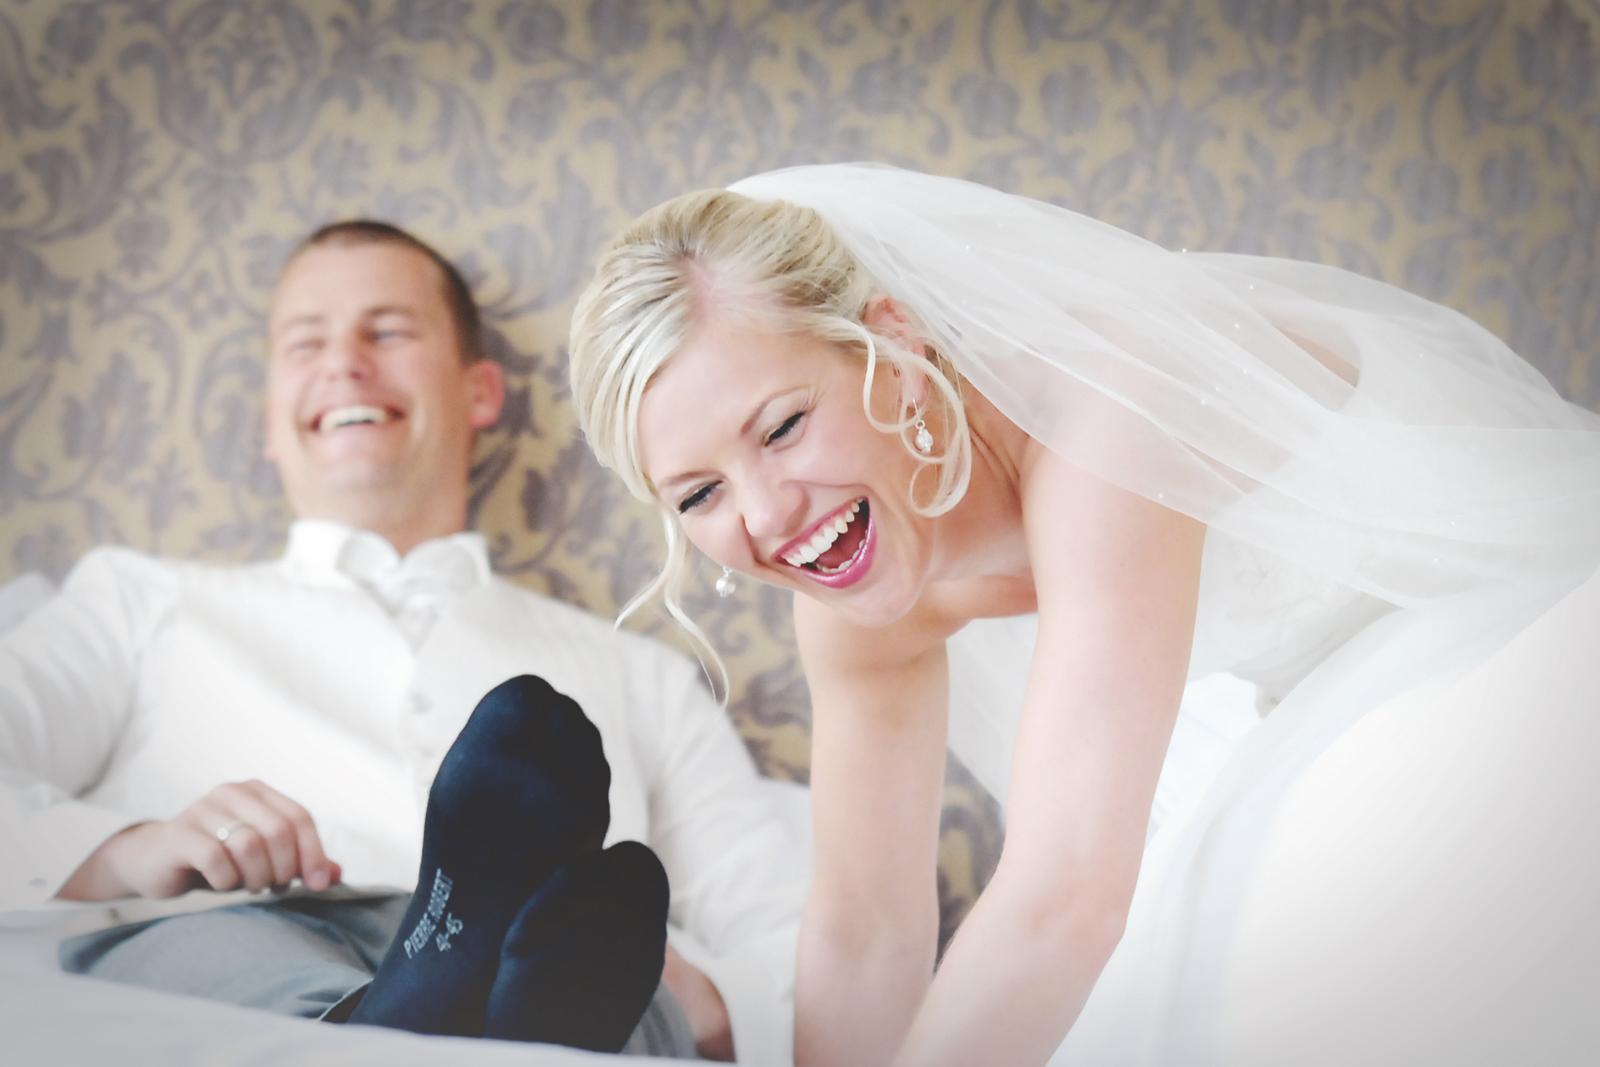 Norwegian Wedding – Photographers at Mijas Costa